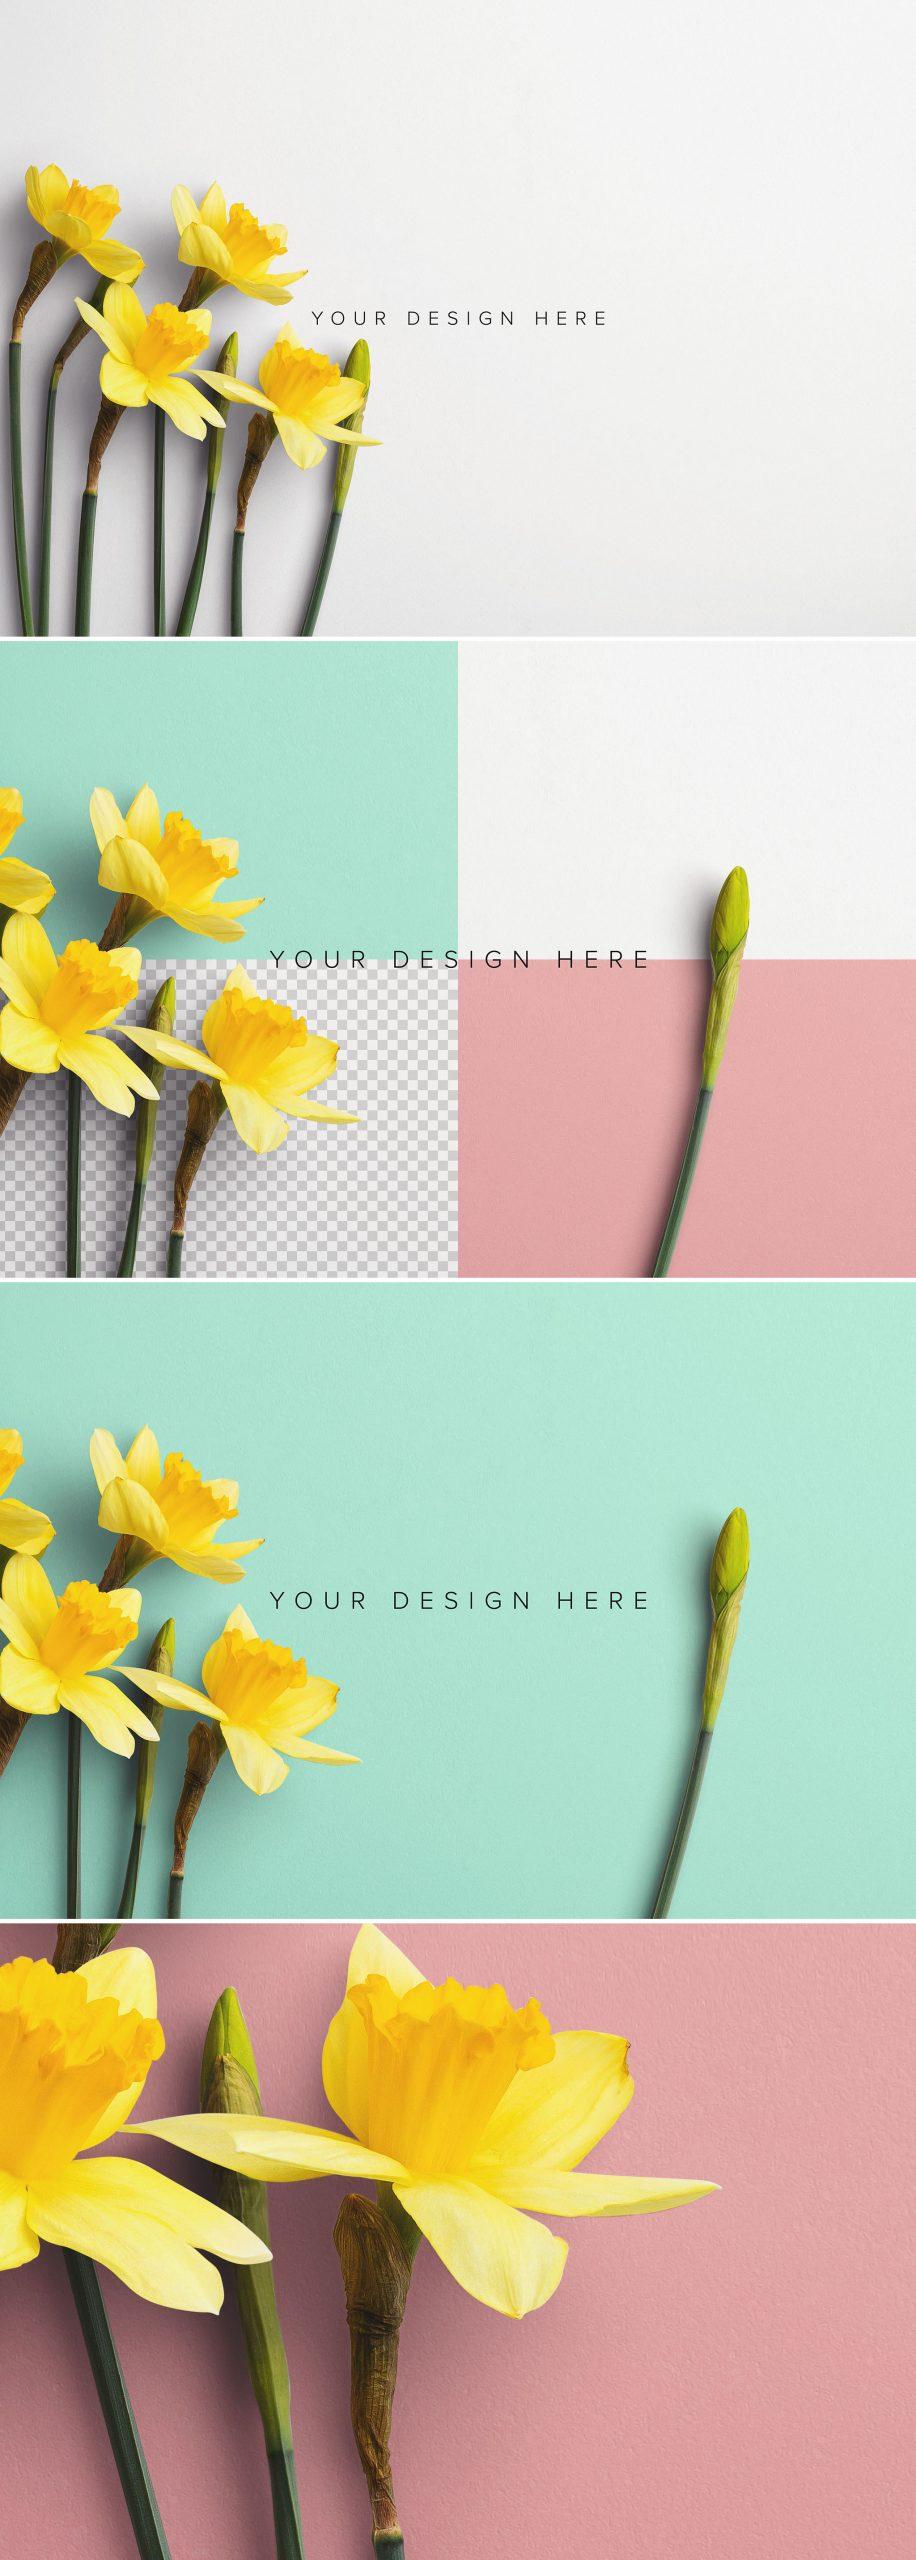 Daffodils Custom Scene Creator Template 9Preview1